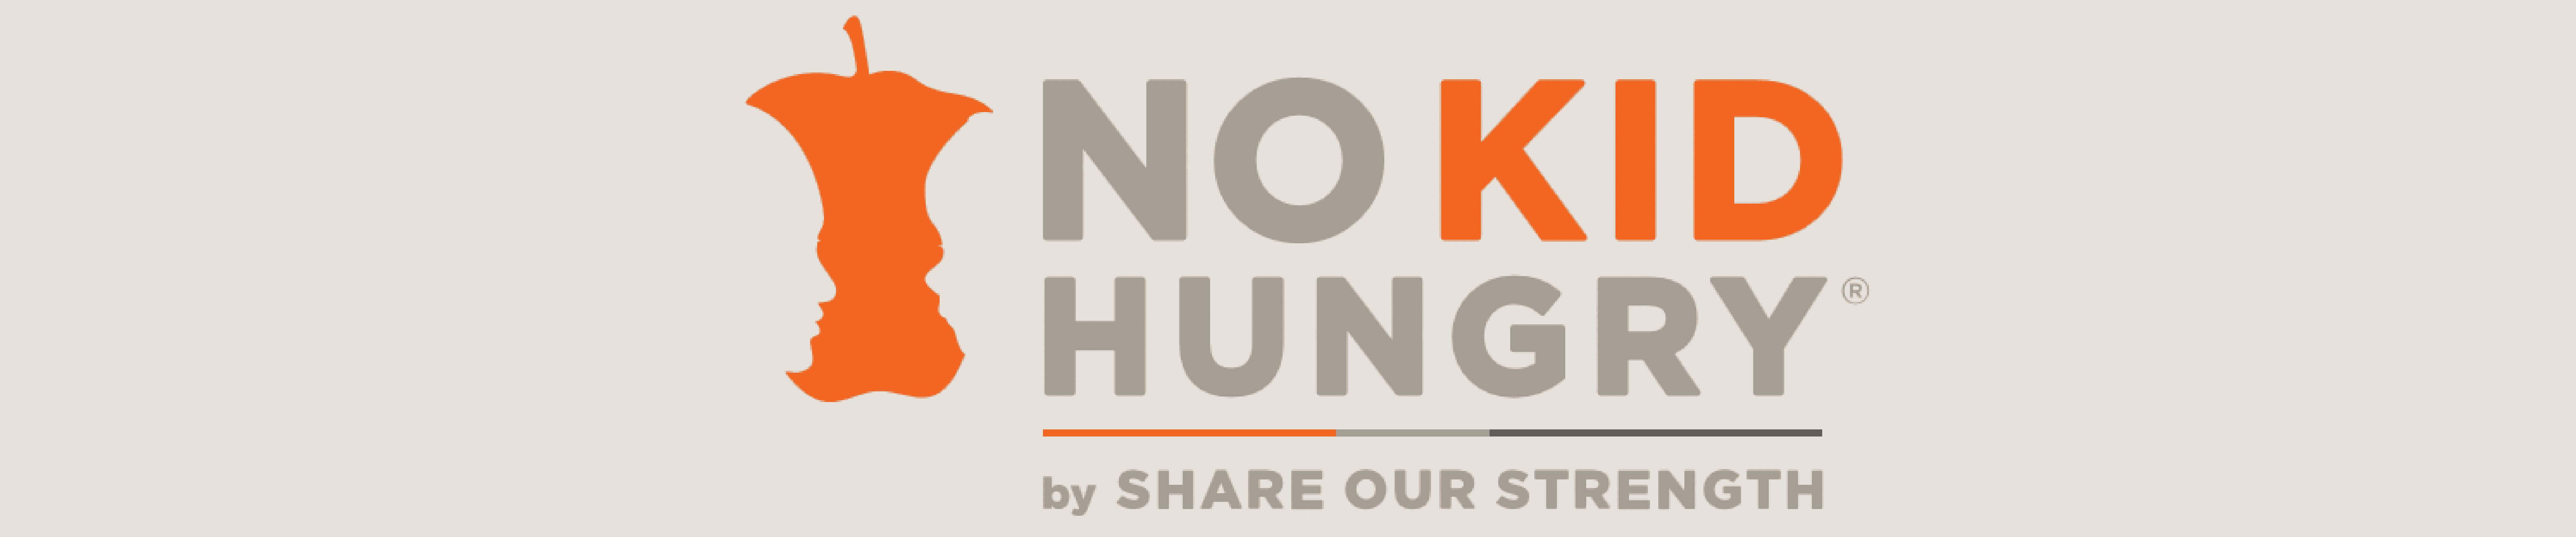 No Kid Hungry Banner Logo